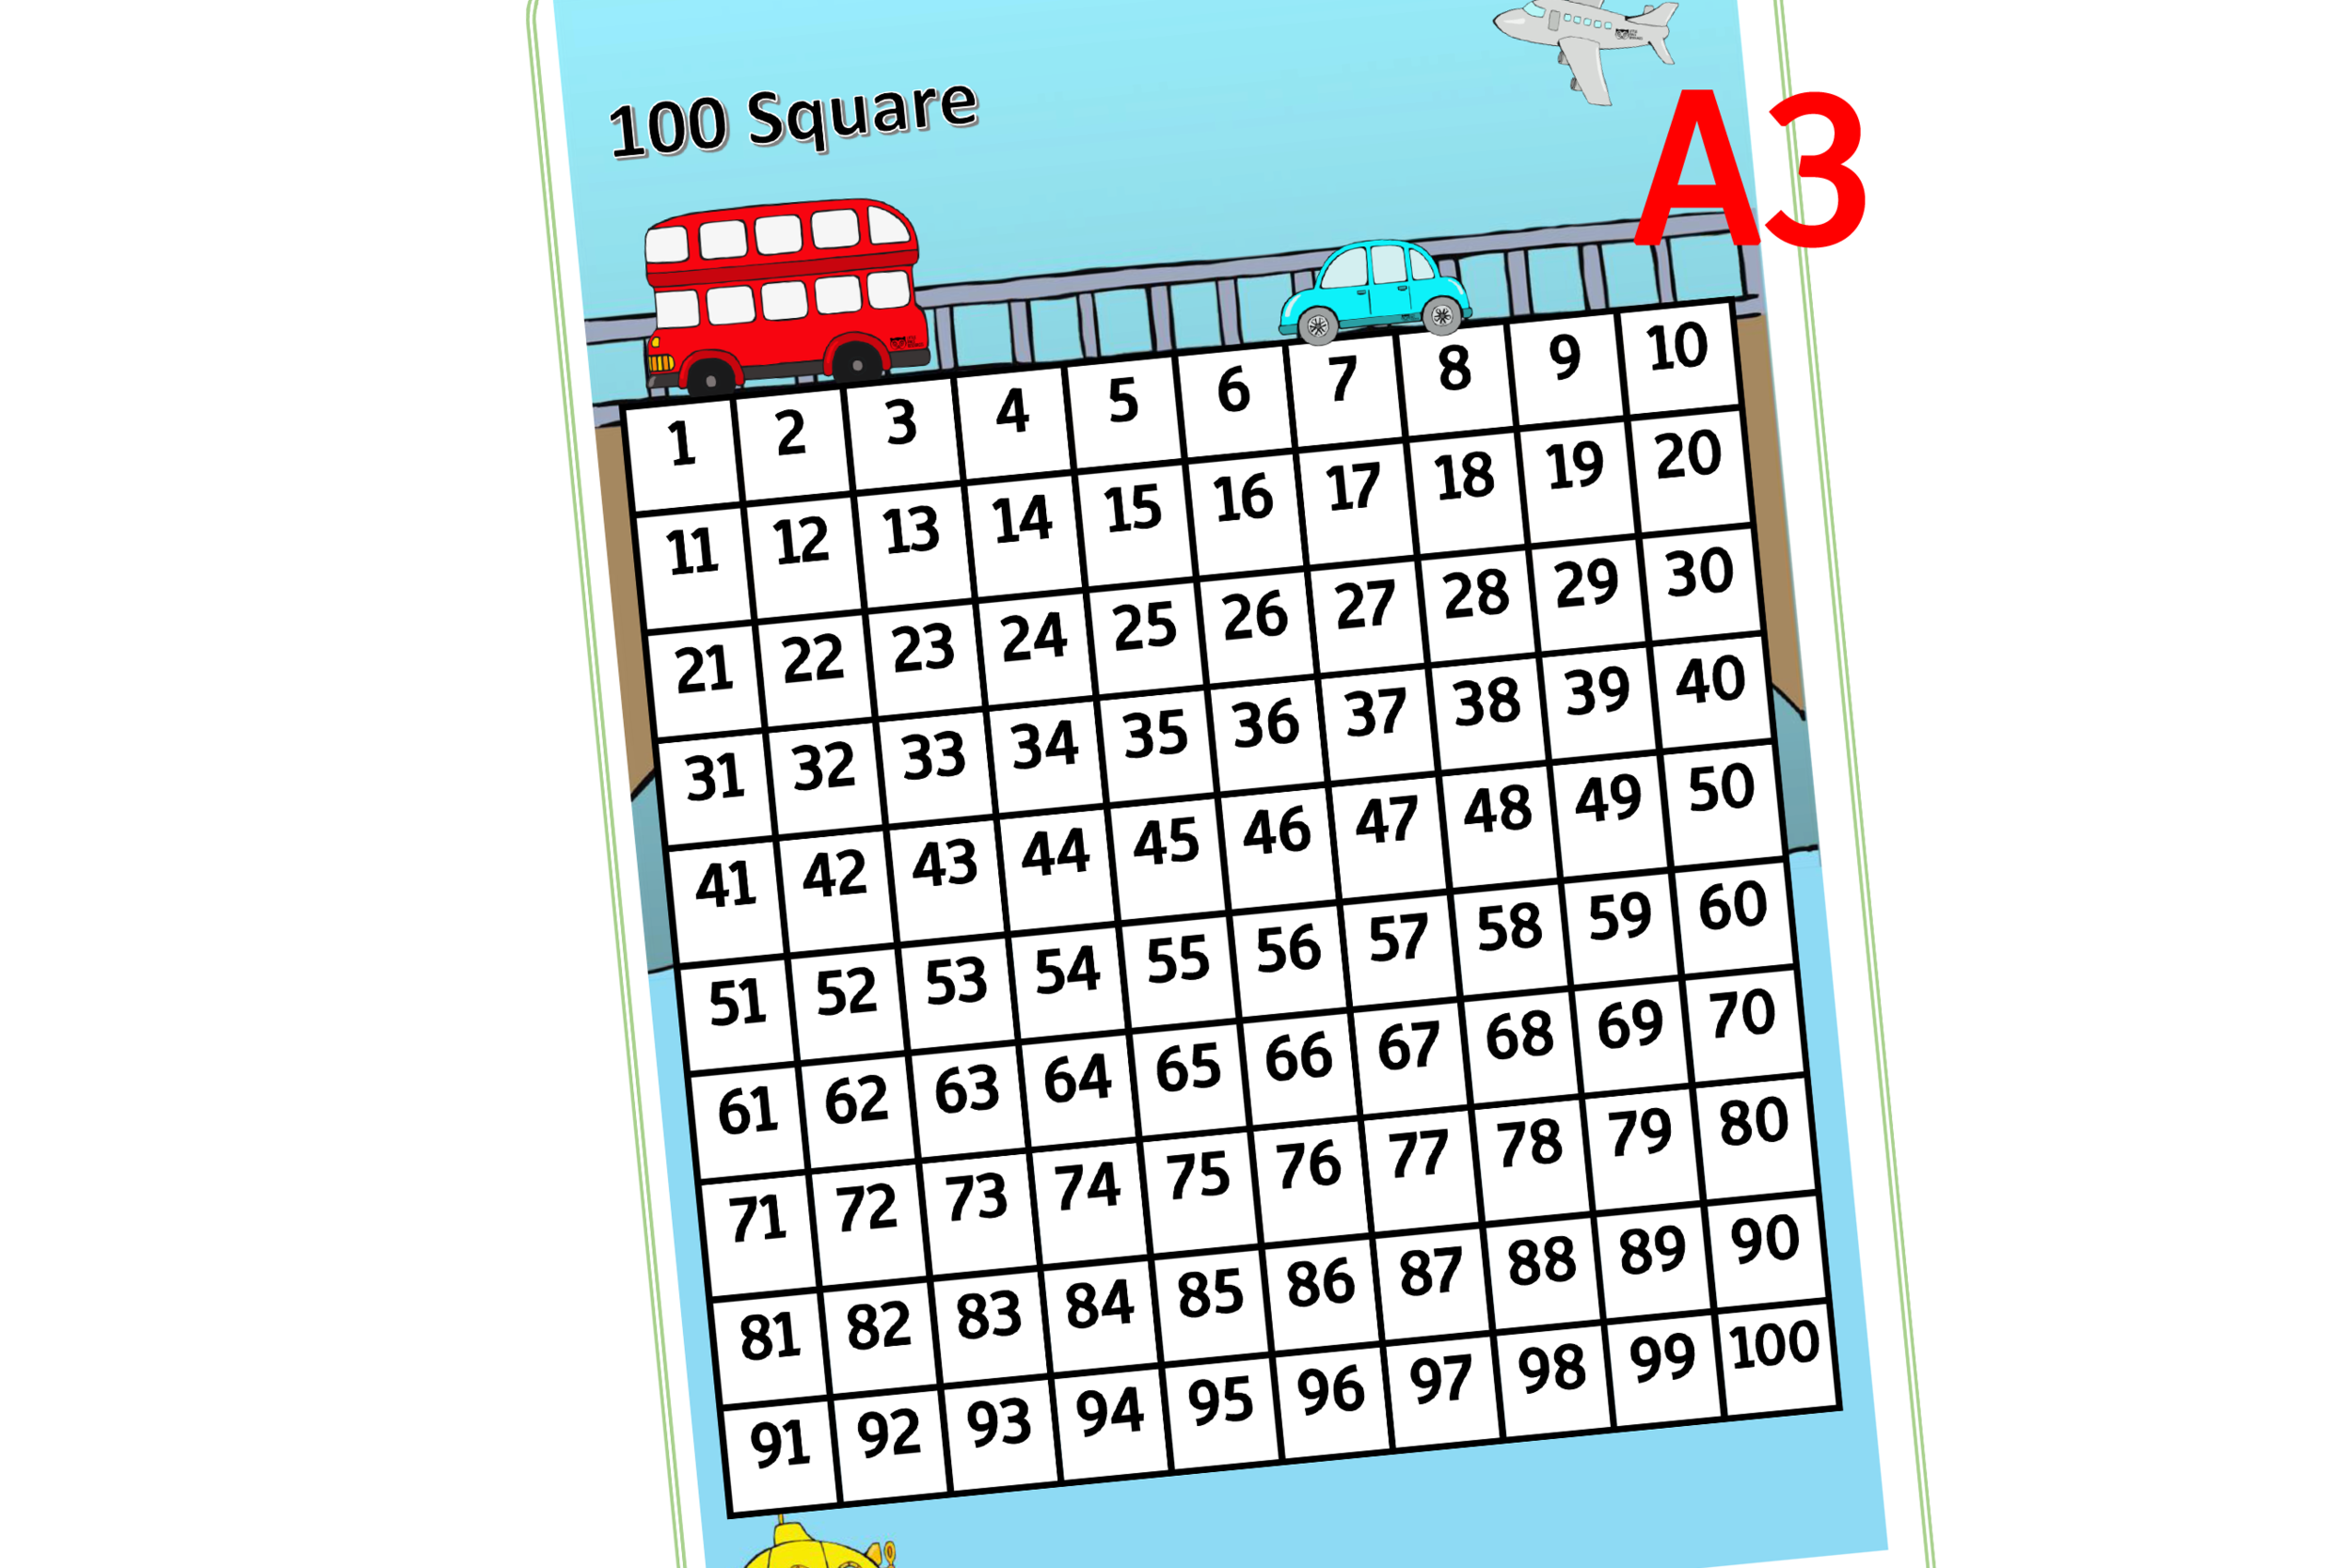 Vehicle/Travel/Transport Theme/Topic 100 Square - A3